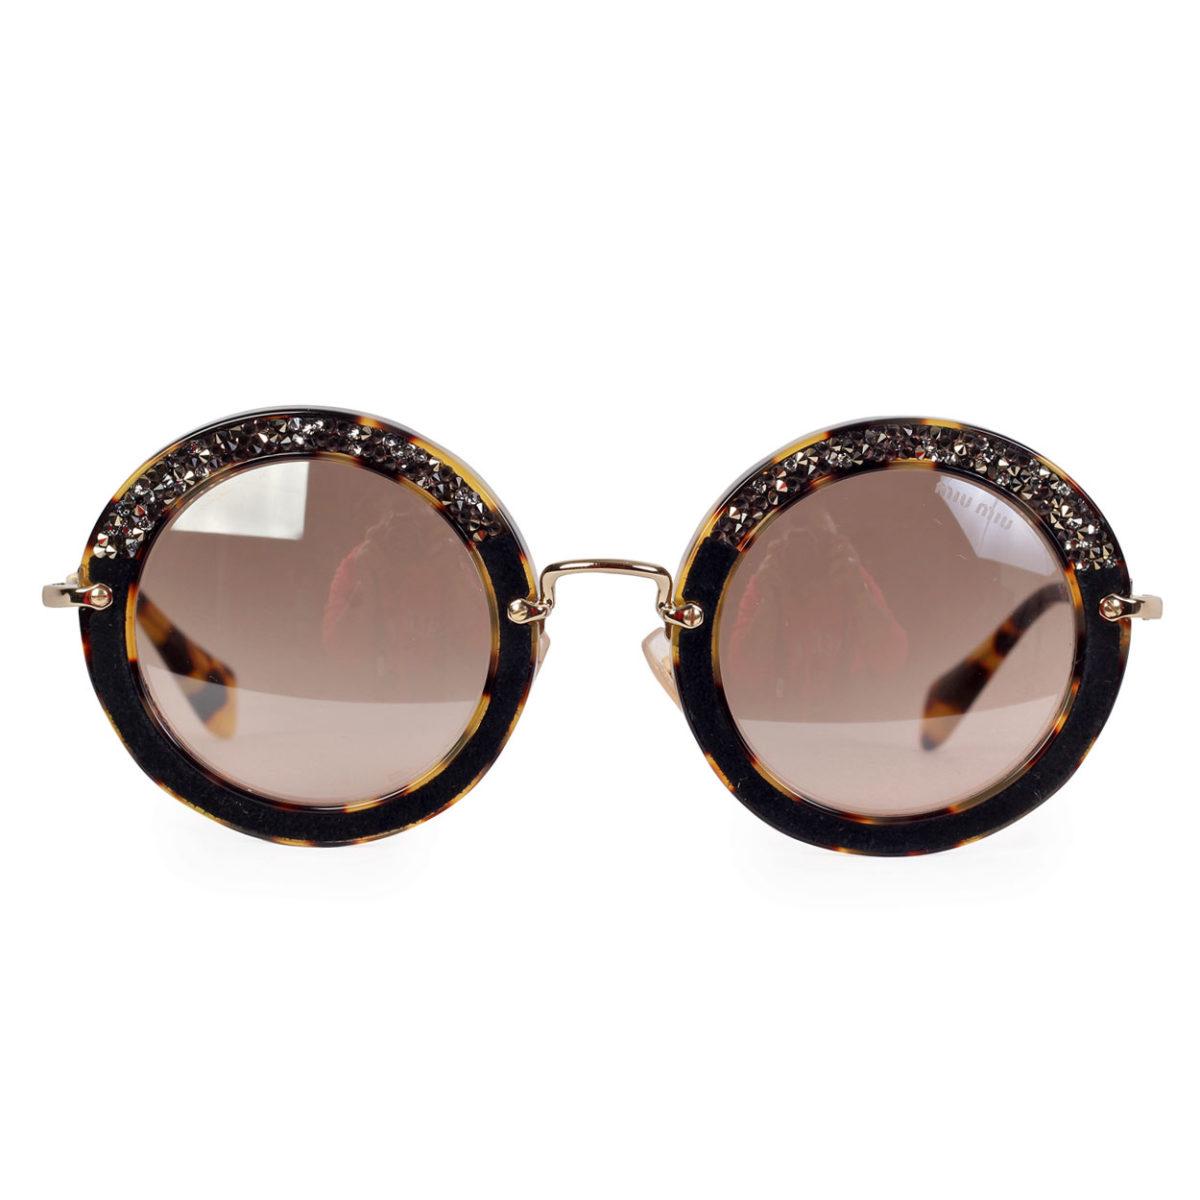 ce88fa8e4 MIU MIU Embellished Tortoise Shell Round Sunglasses SMU08R – NEW ...